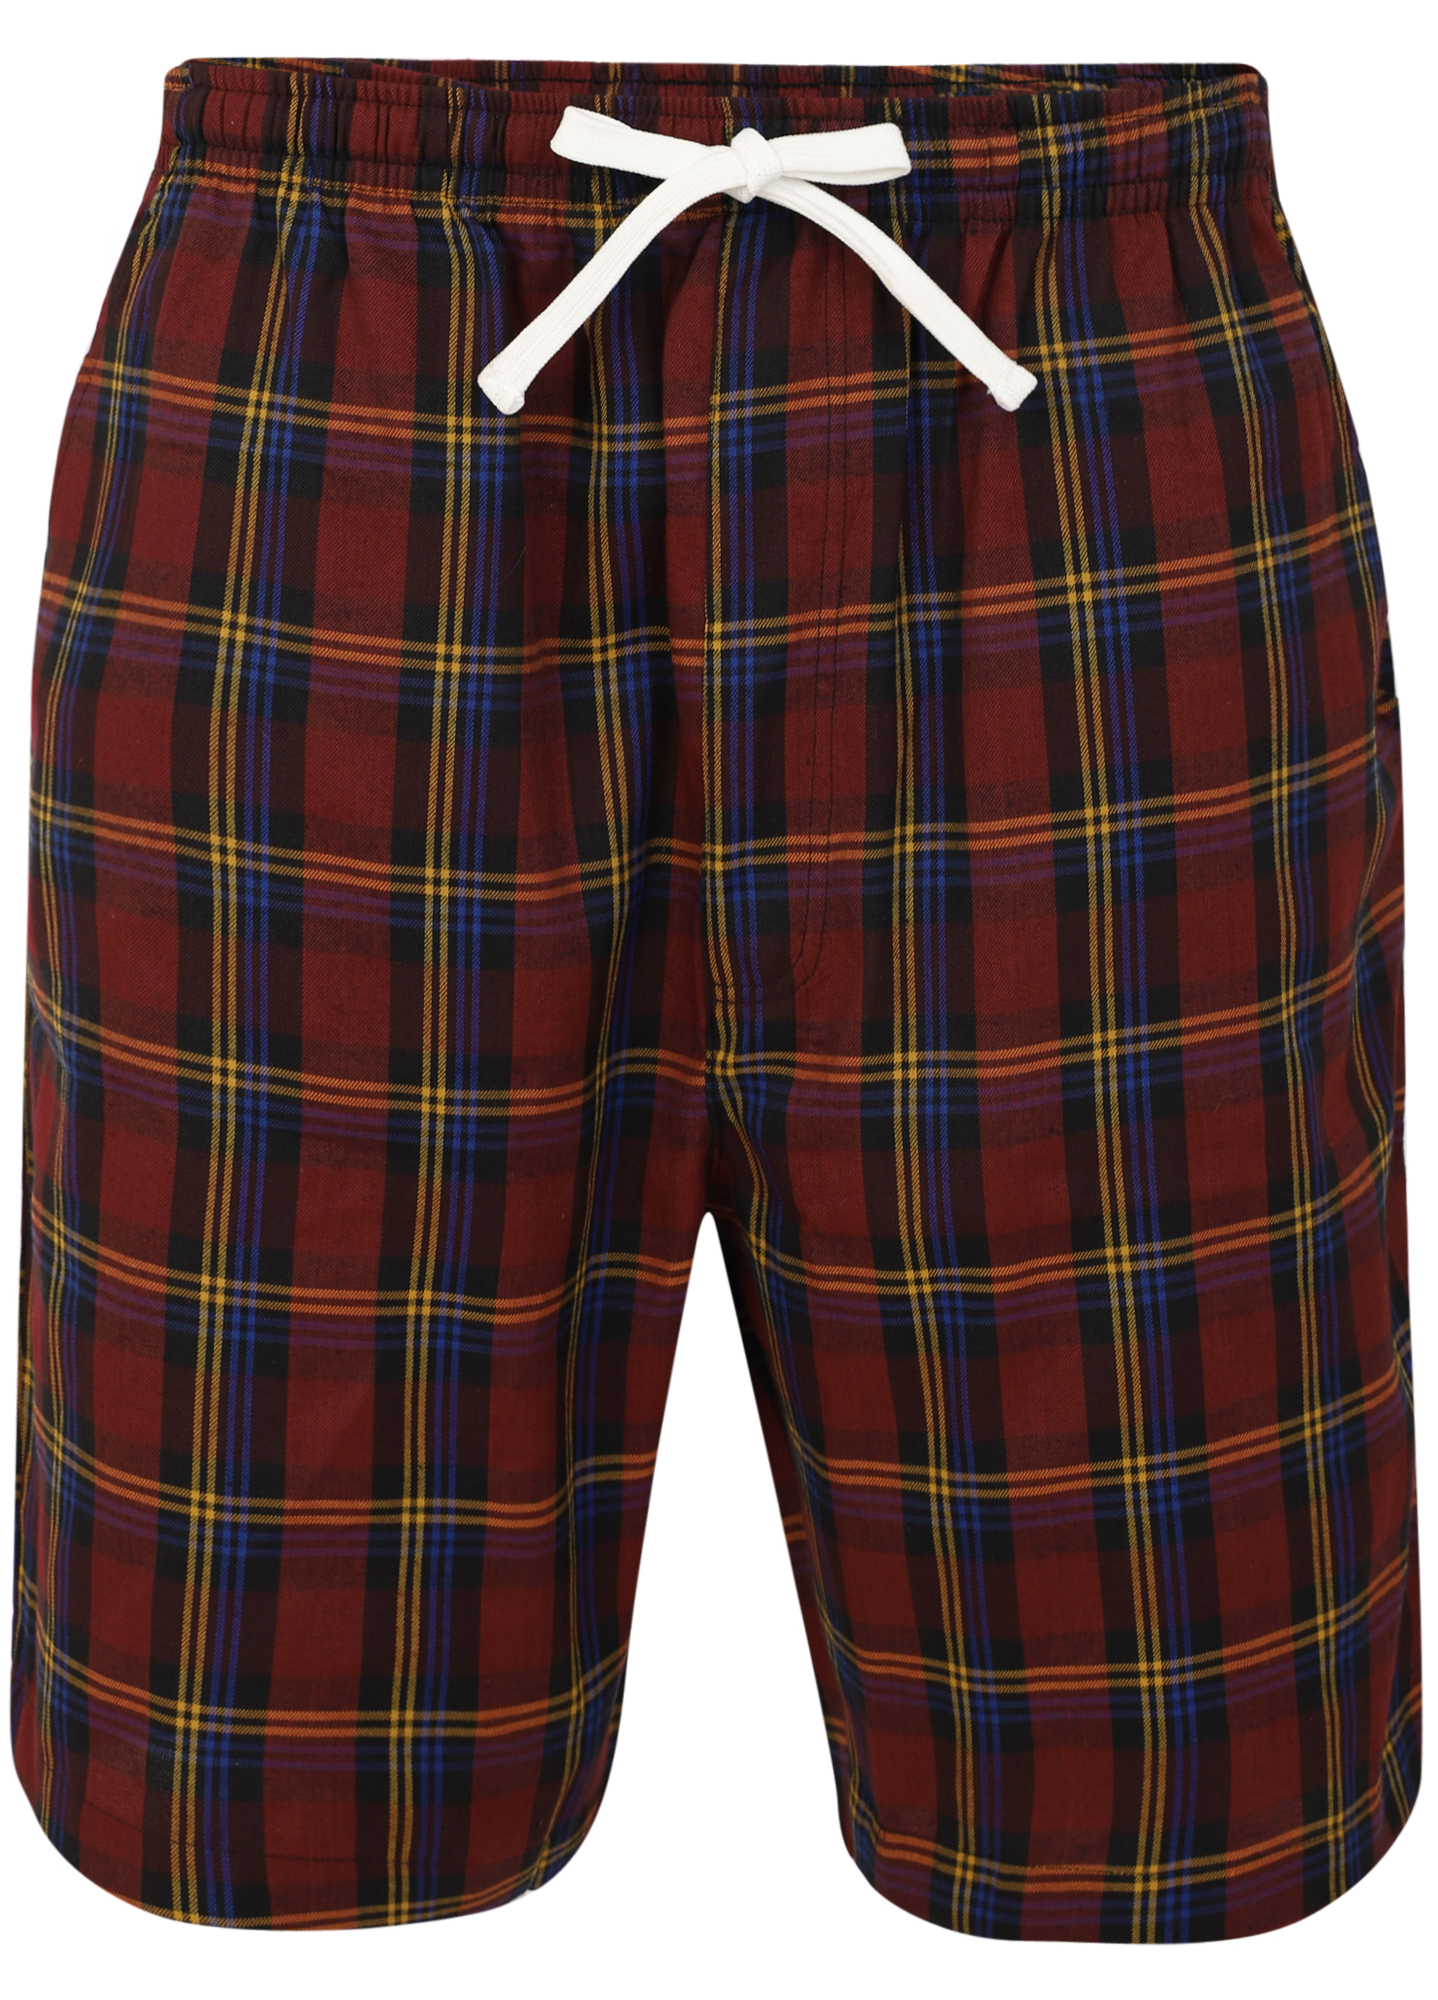 Big Mens Cotton Valley Forty Winks Pyjama Set Blue 2XL,3XL,4XL,5XL,6XL,7XL,8XL